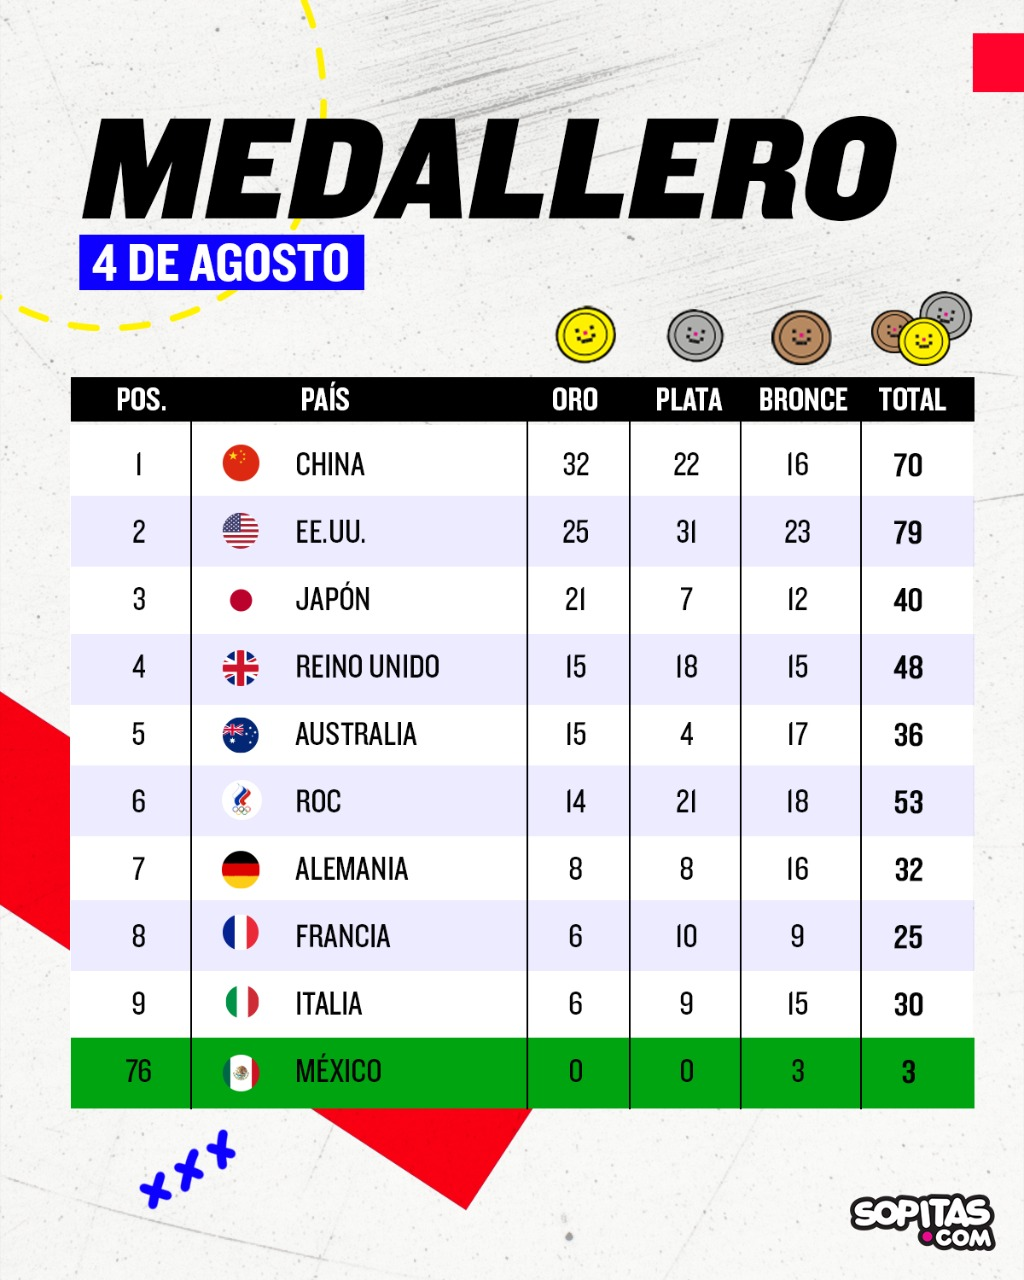 Medallero olímpico Tokio 2020